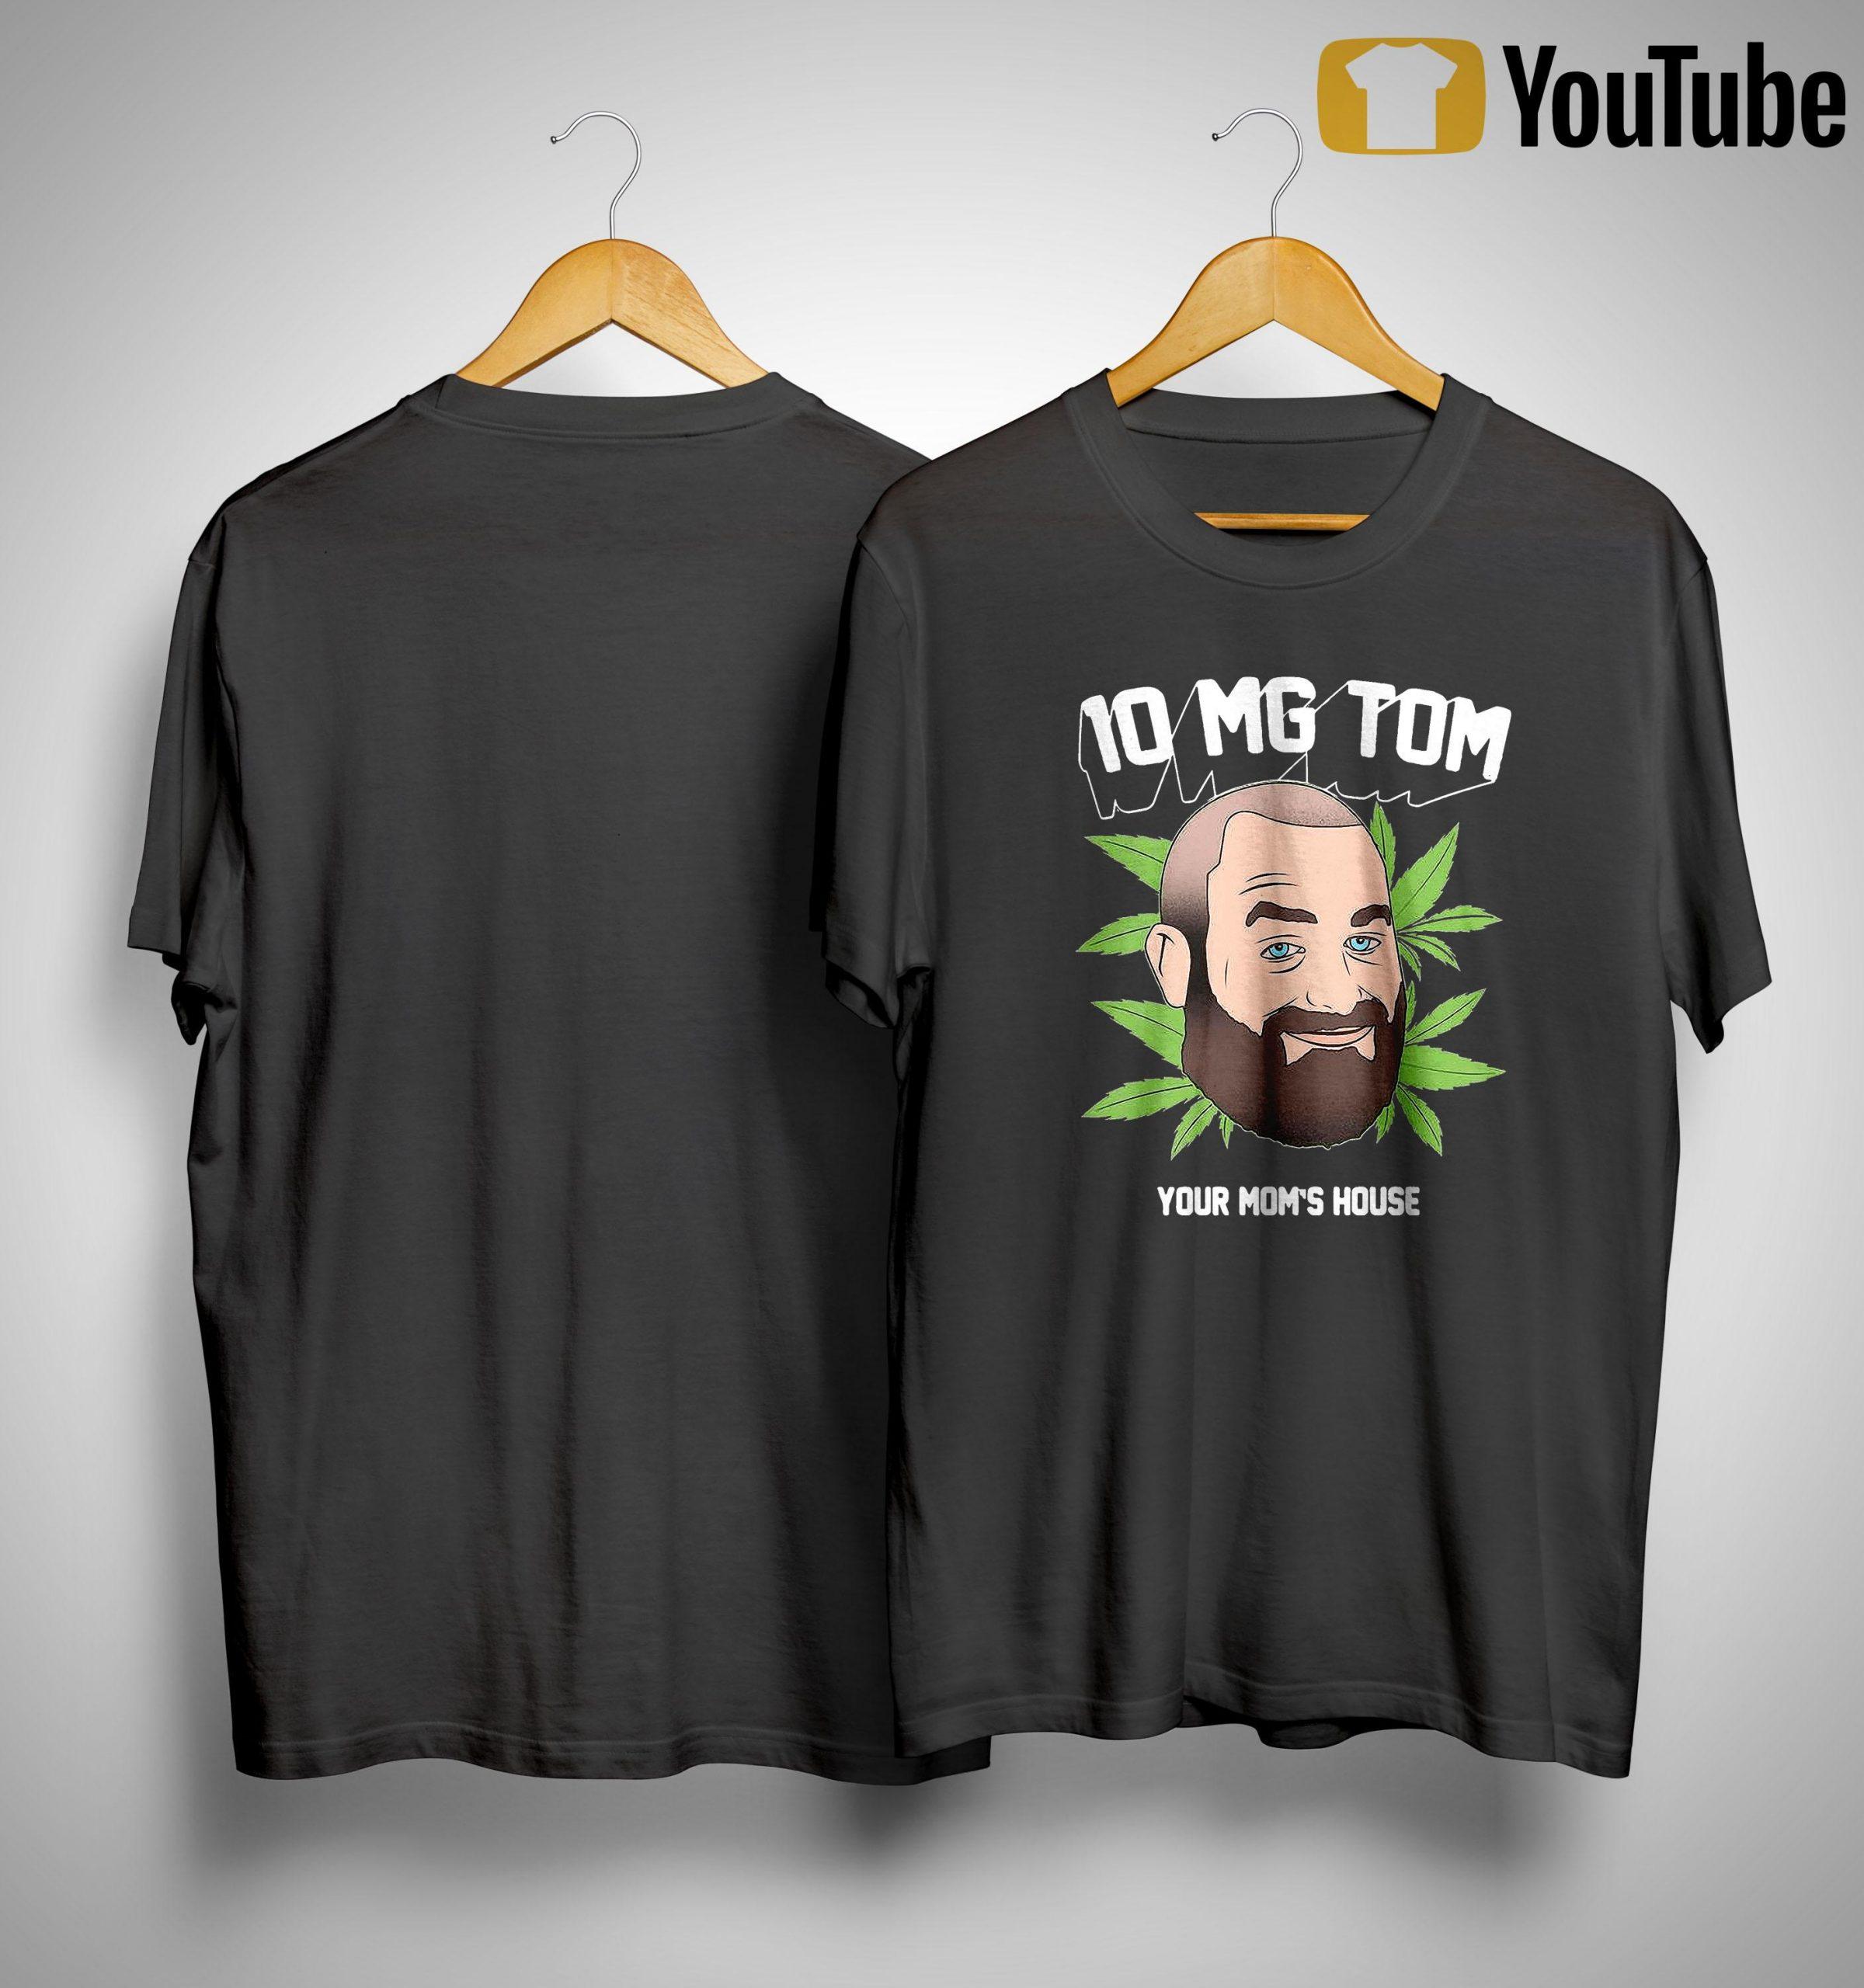 Tom Segura Weed 10mg Your Mom's House Shirt